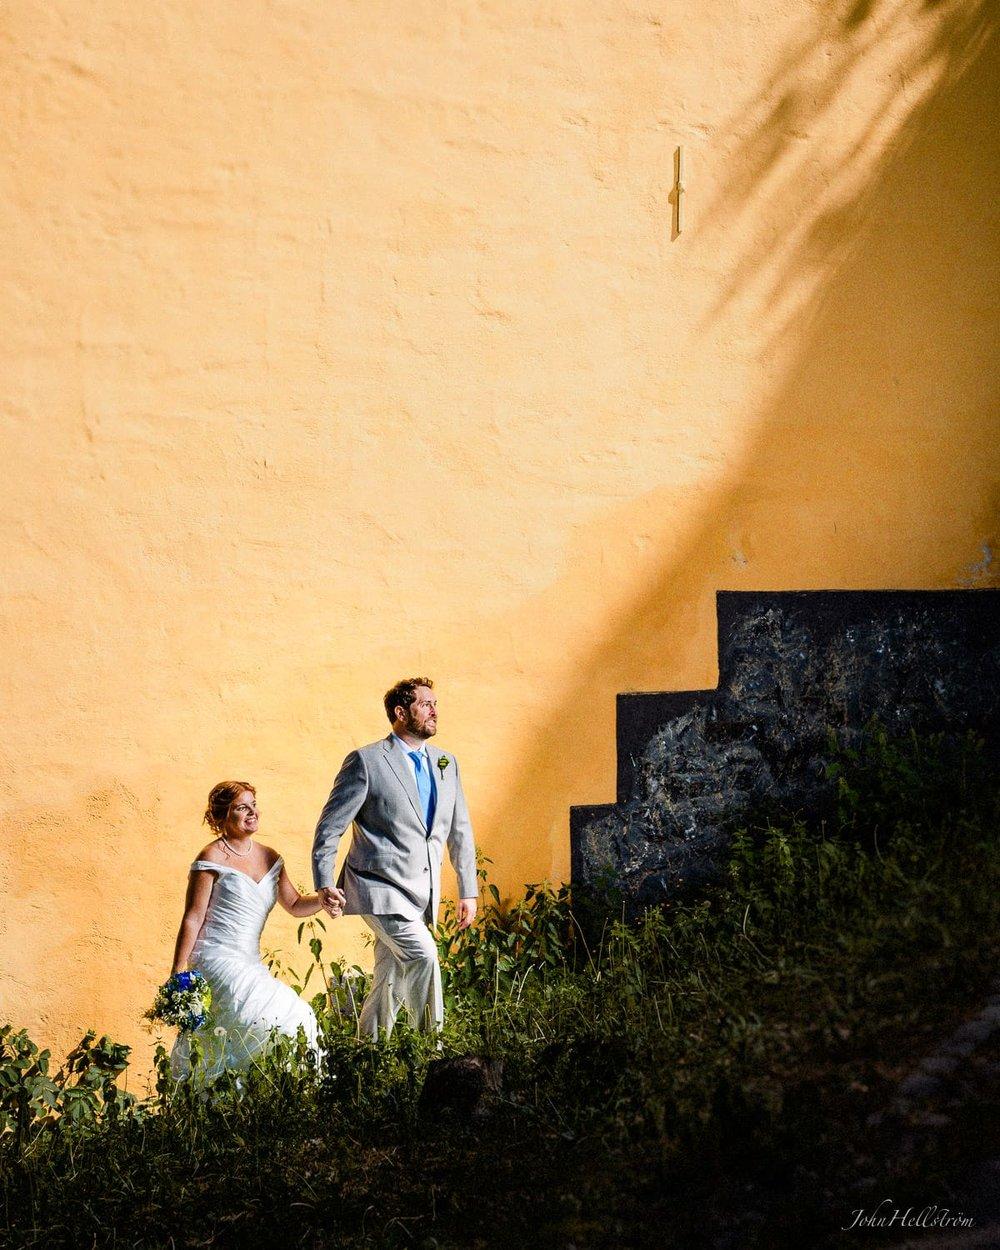 wedding-photographer-brollop-fotograf-brollopsfotograf-stockholm-grebbestad-00031.jpg